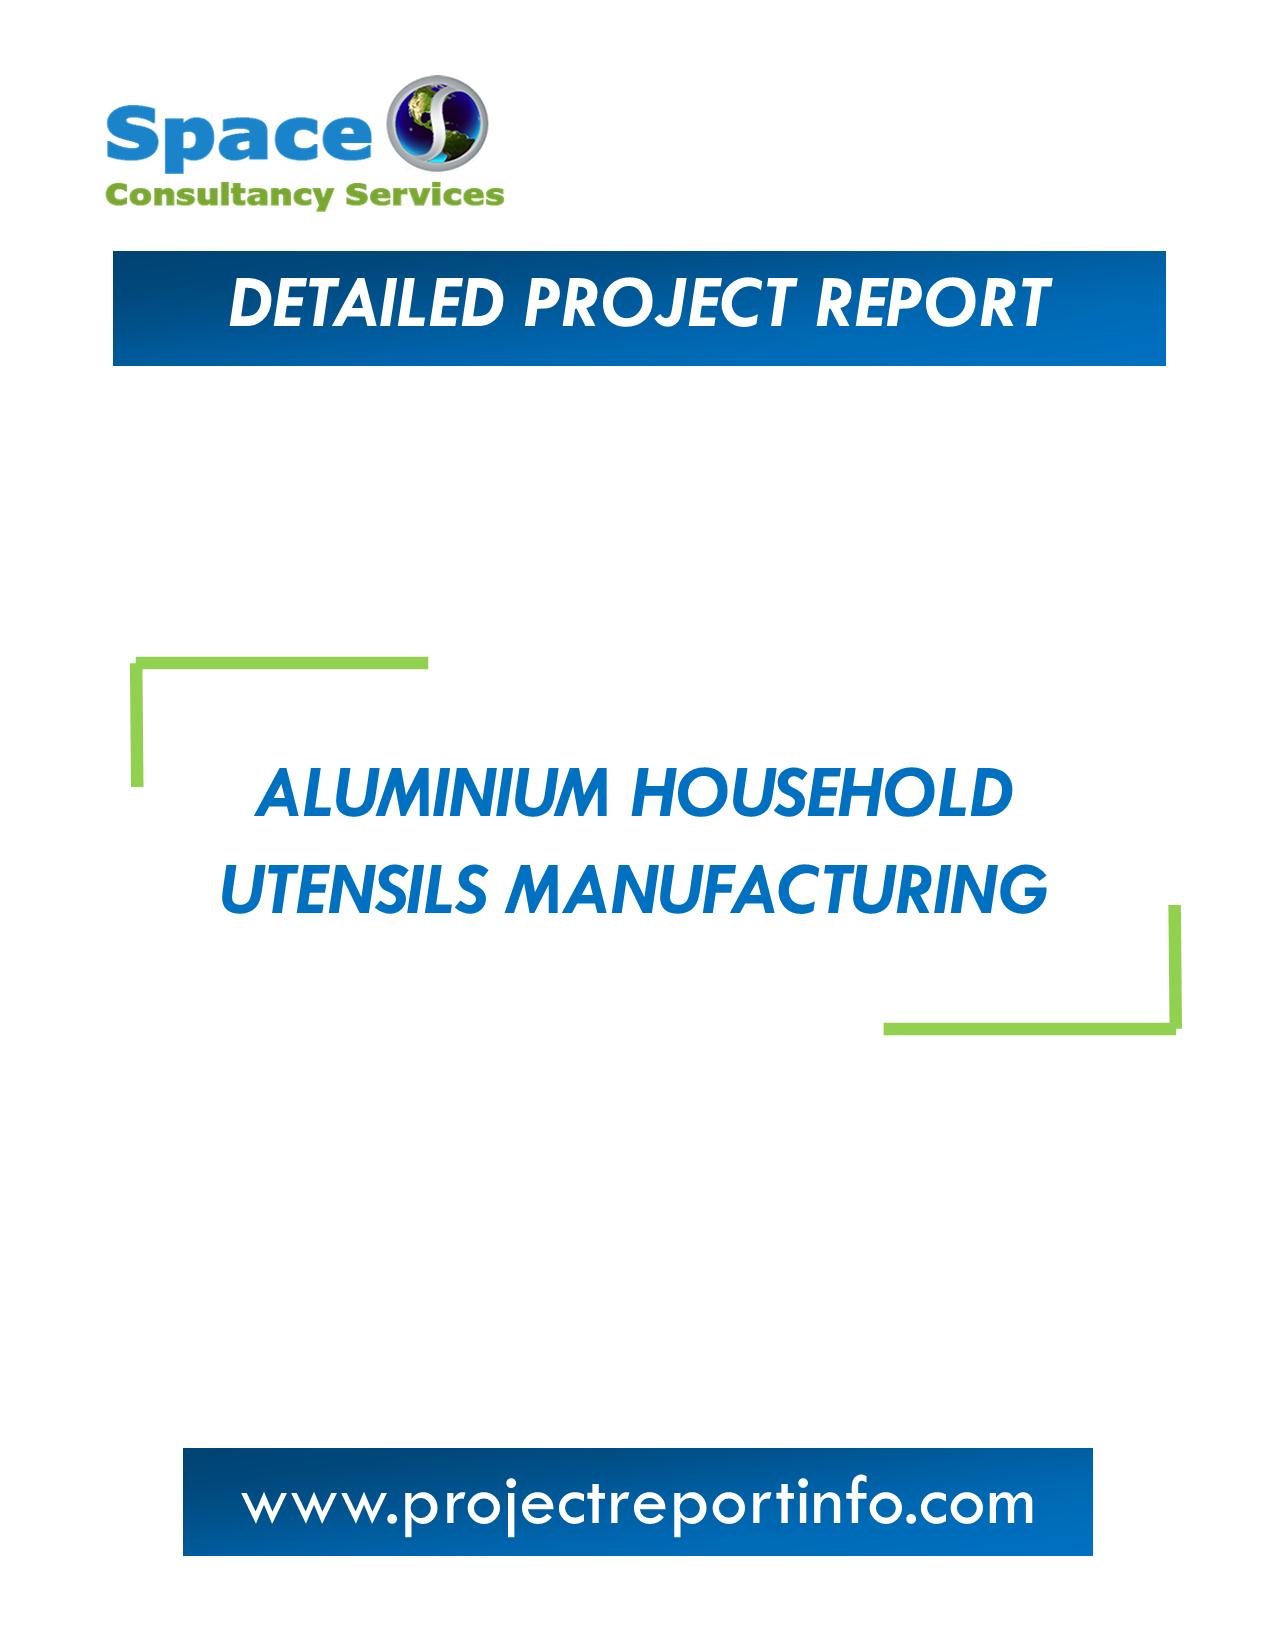 Project Report on Aluminium Household Utensils